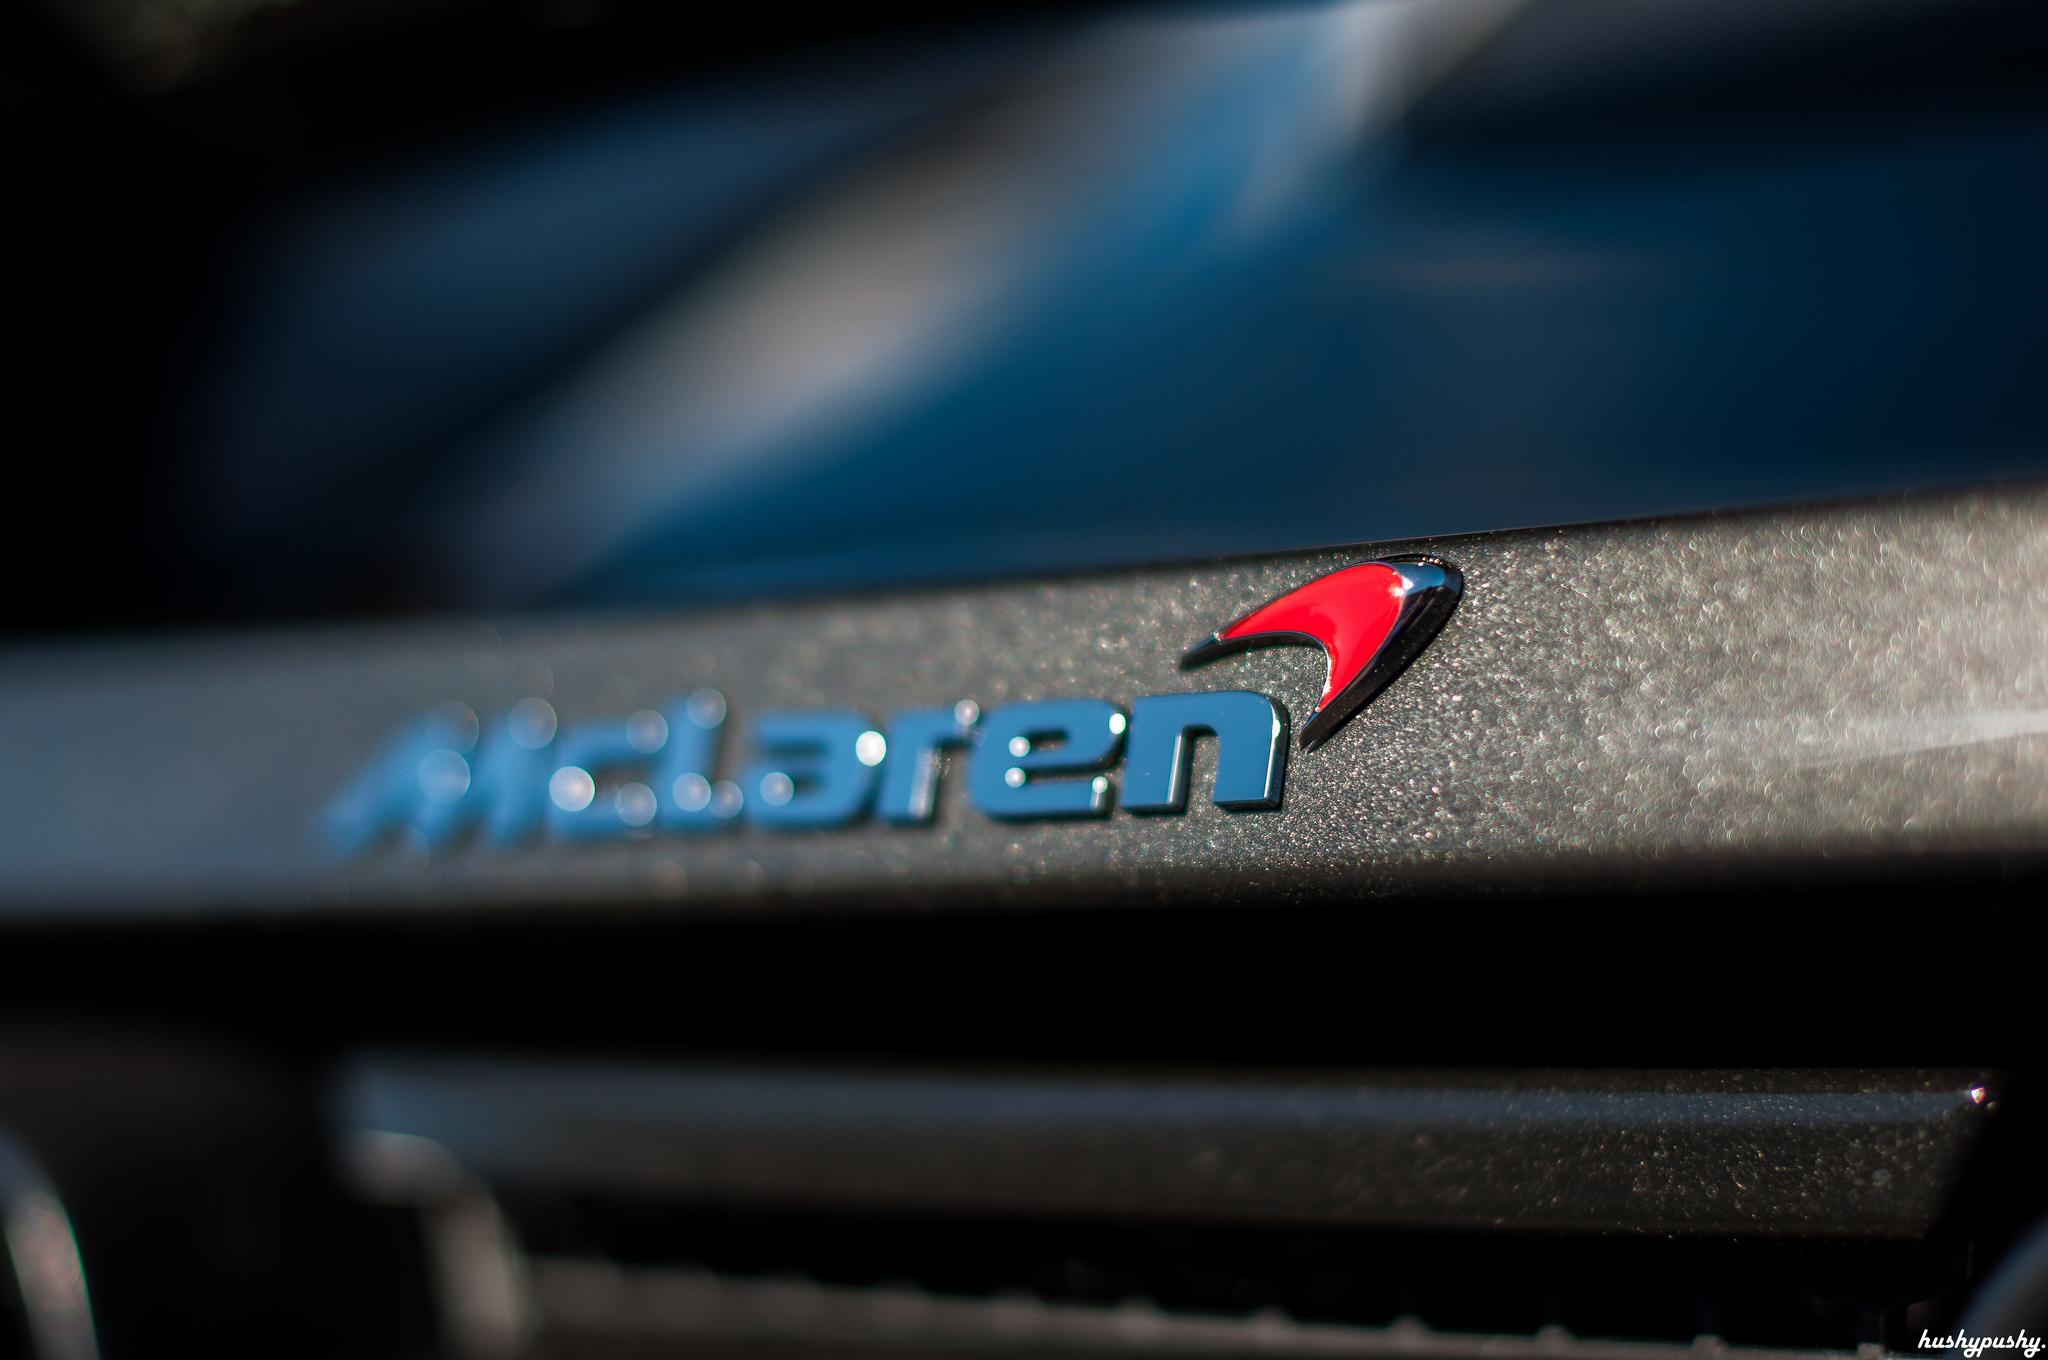 World Best Car Hd Wallpaper 1080p Behind The Badge A Study On Mclaren S Quot Swoosh Quot Design